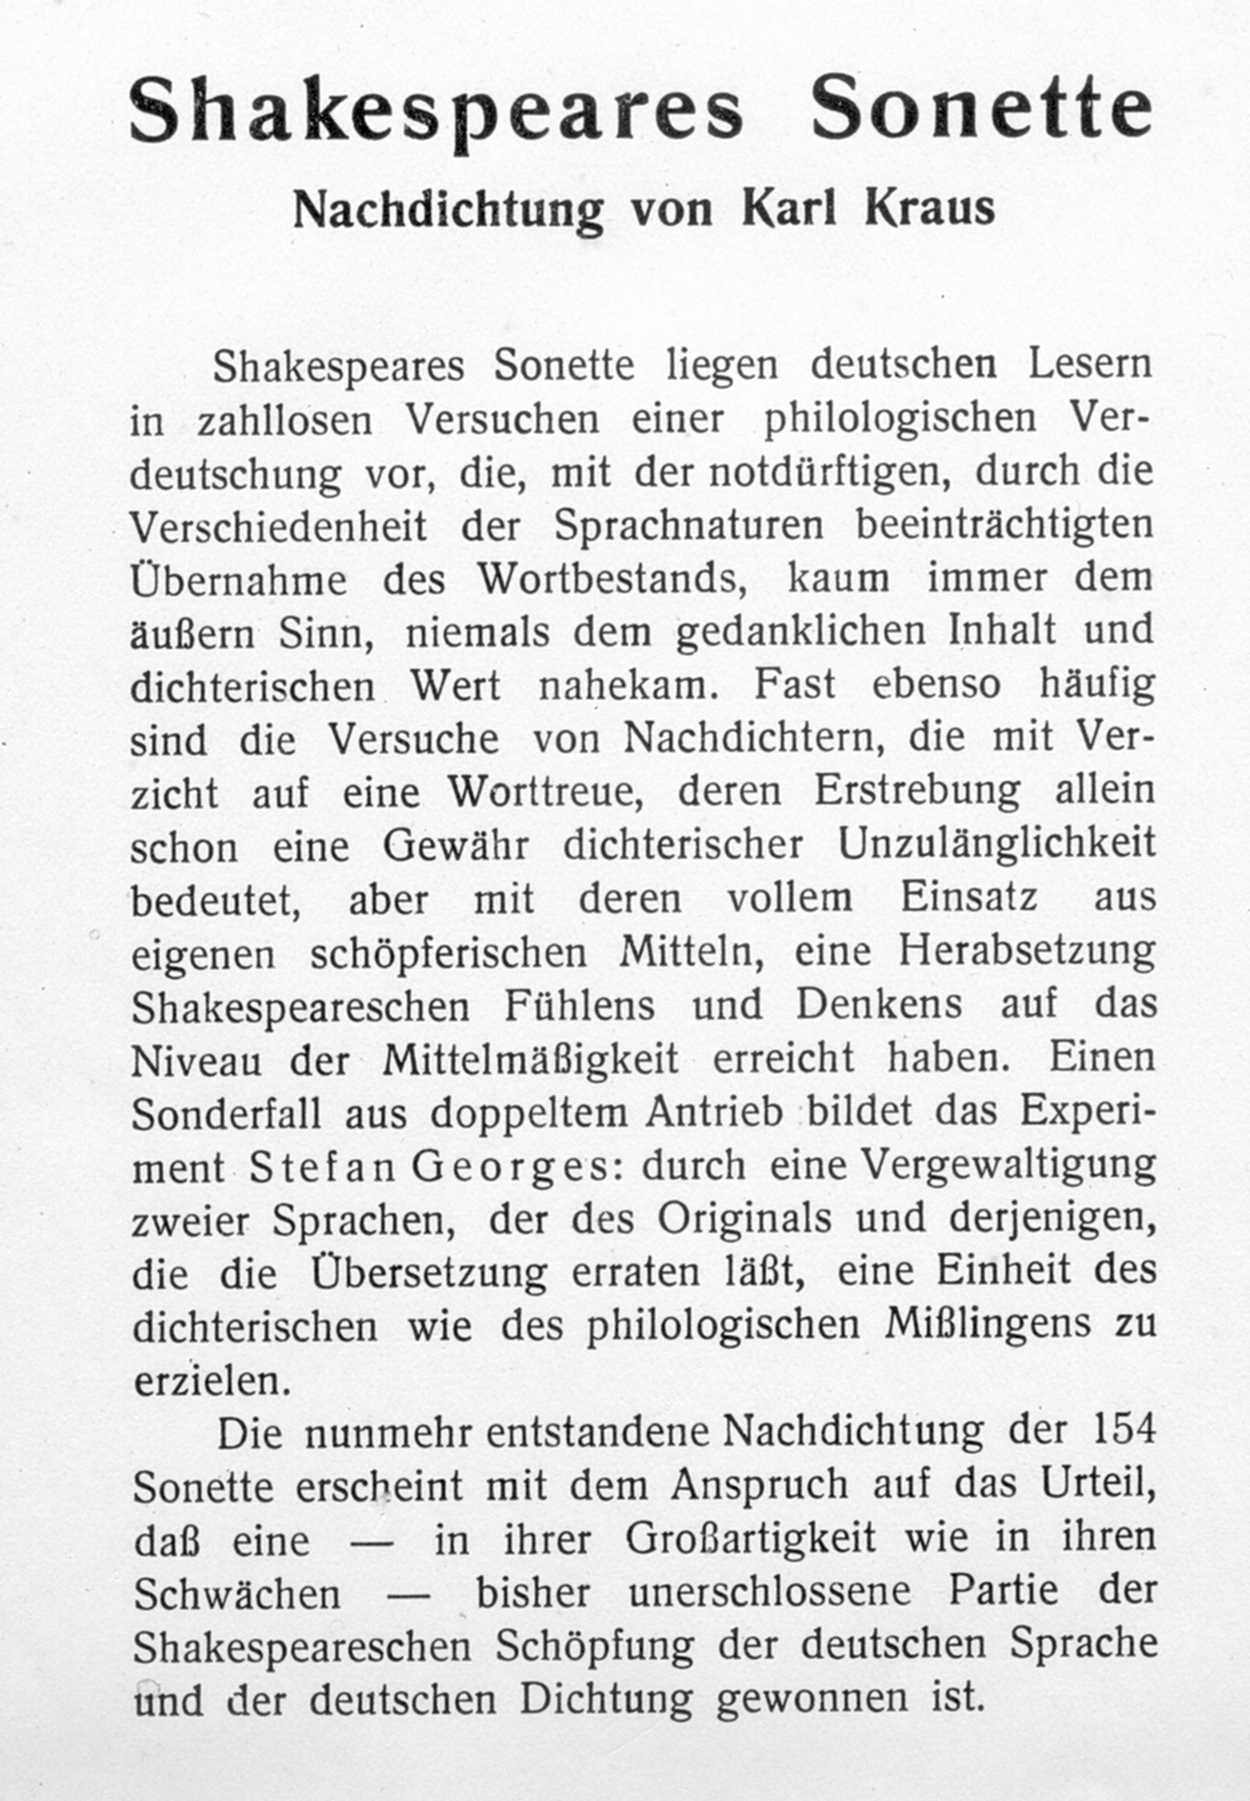 departed Гјbersetzung